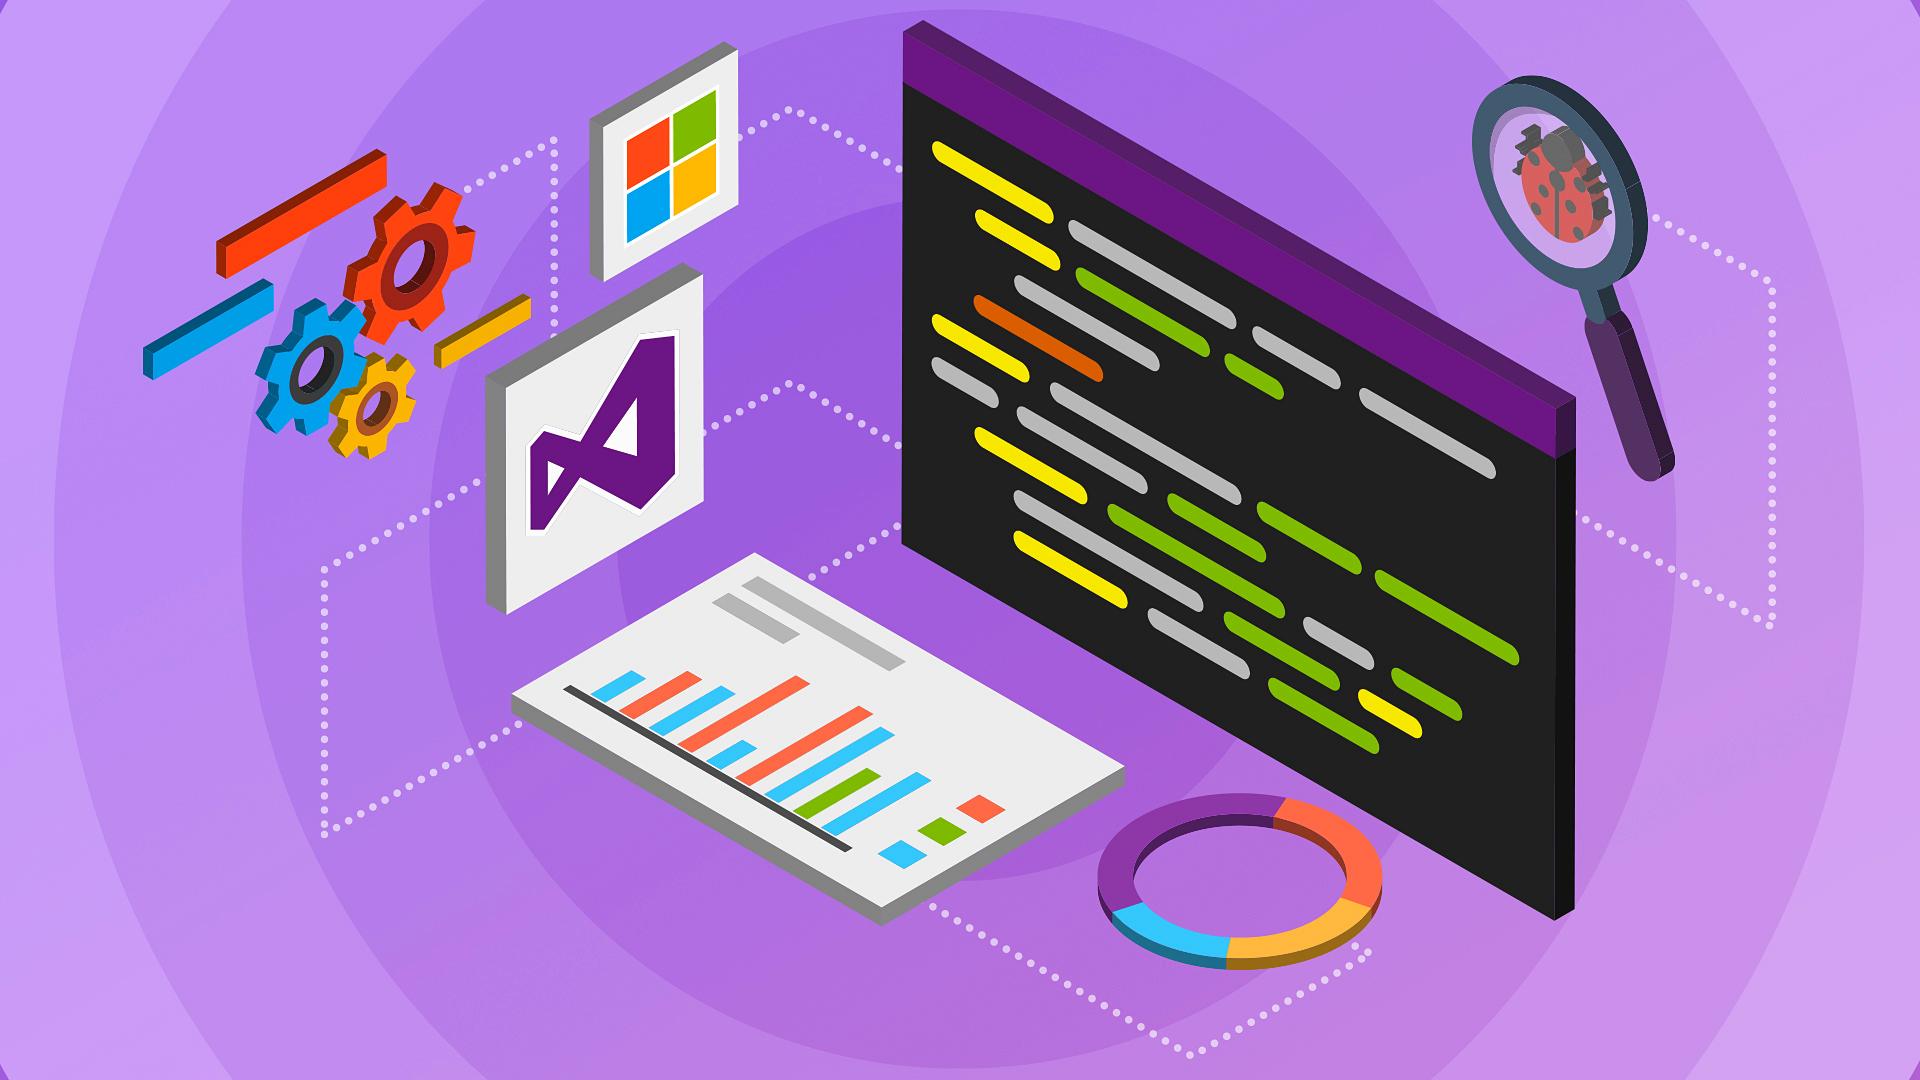 Вебинар Отладка C# приложений в Visual Studio фото